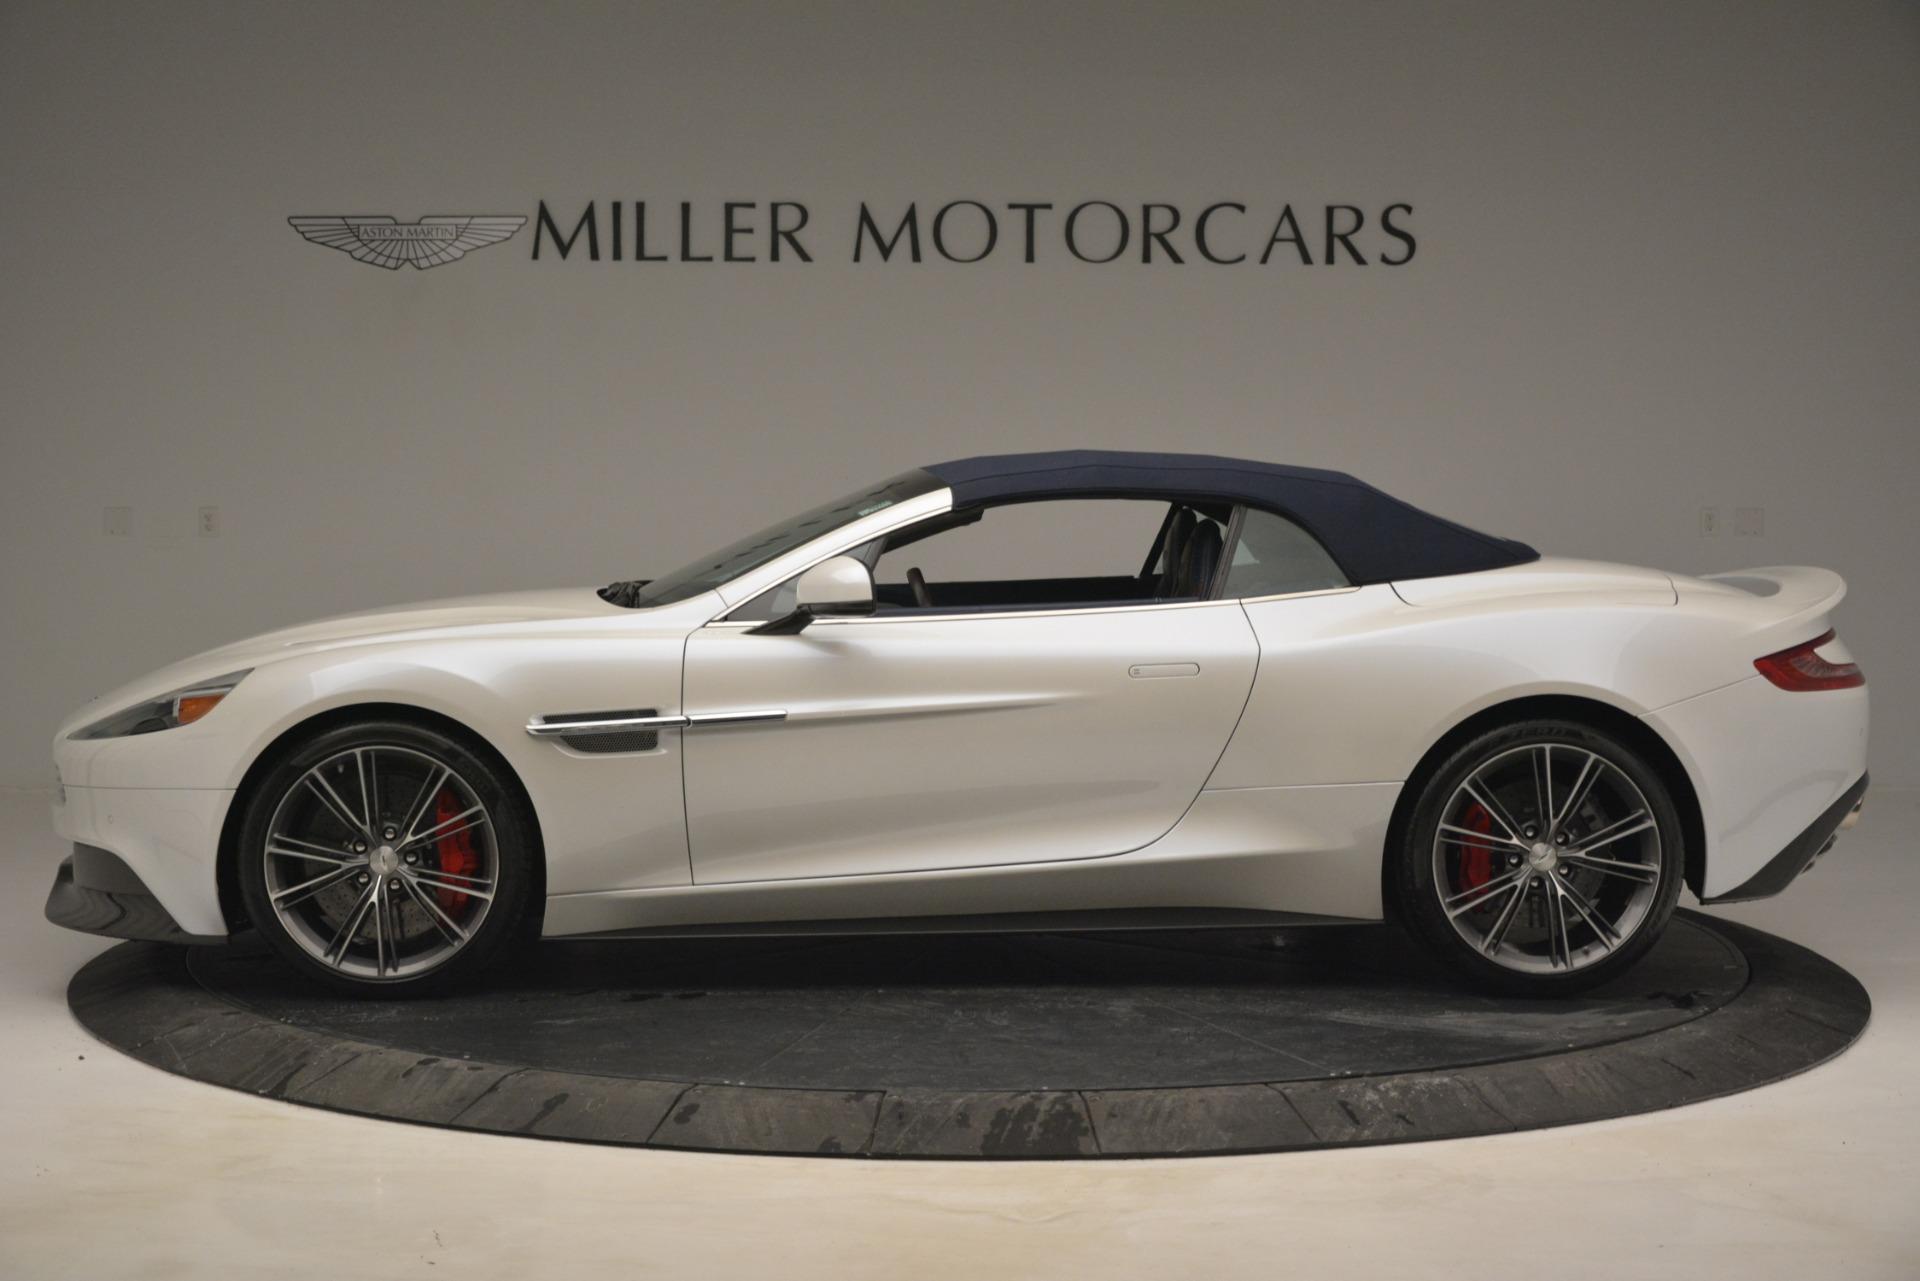 Used 2015 Aston Martin Vanquish Convertible For Sale In Greenwich, CT. Alfa Romeo of Greenwich, 7507 2982_p16